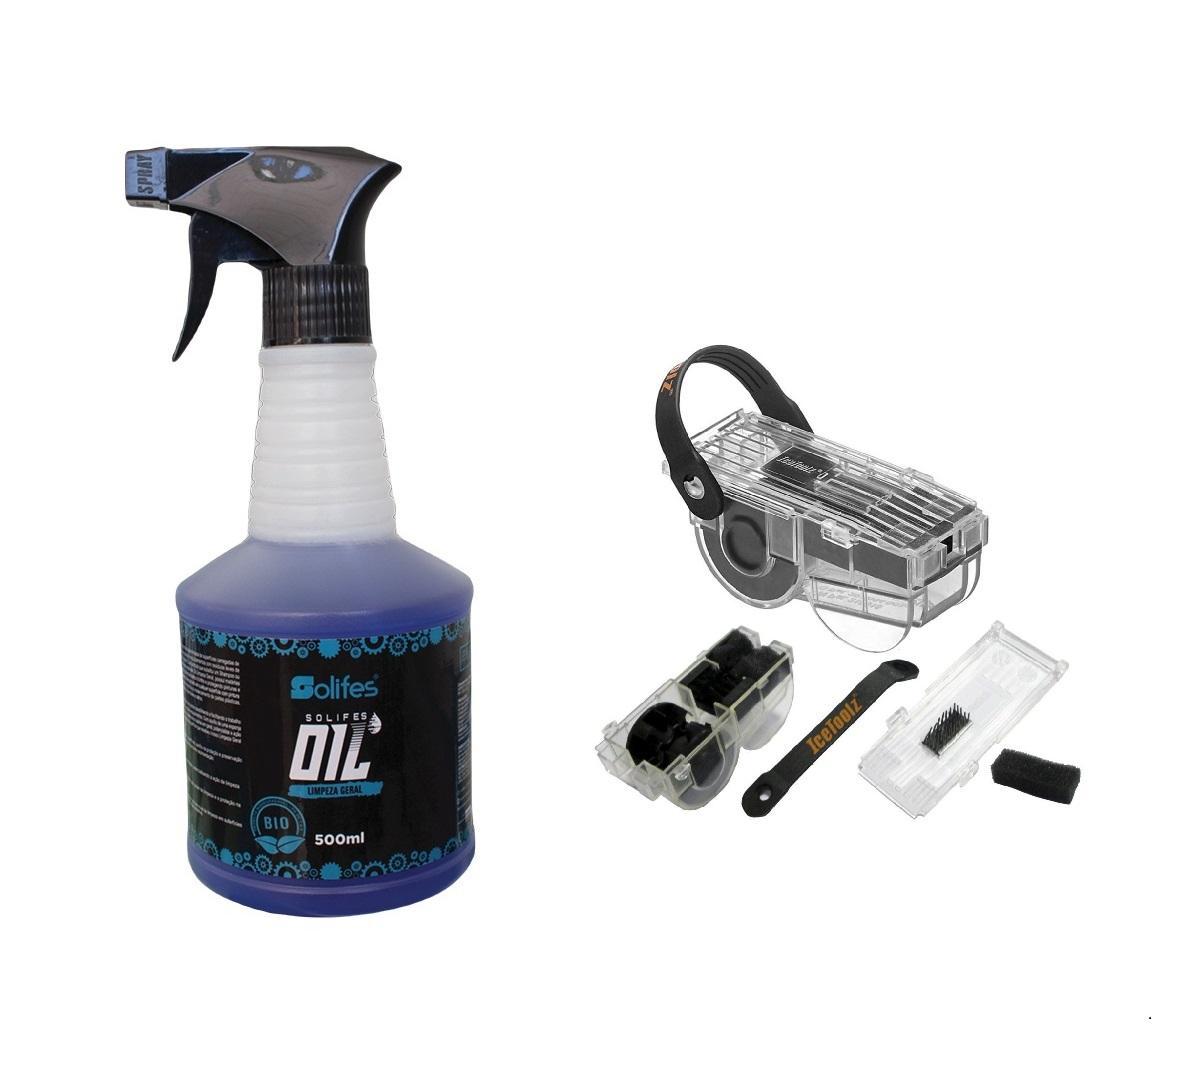 Limpador corrente Ice toolz Bike e Limpeza geral solifes 500ml